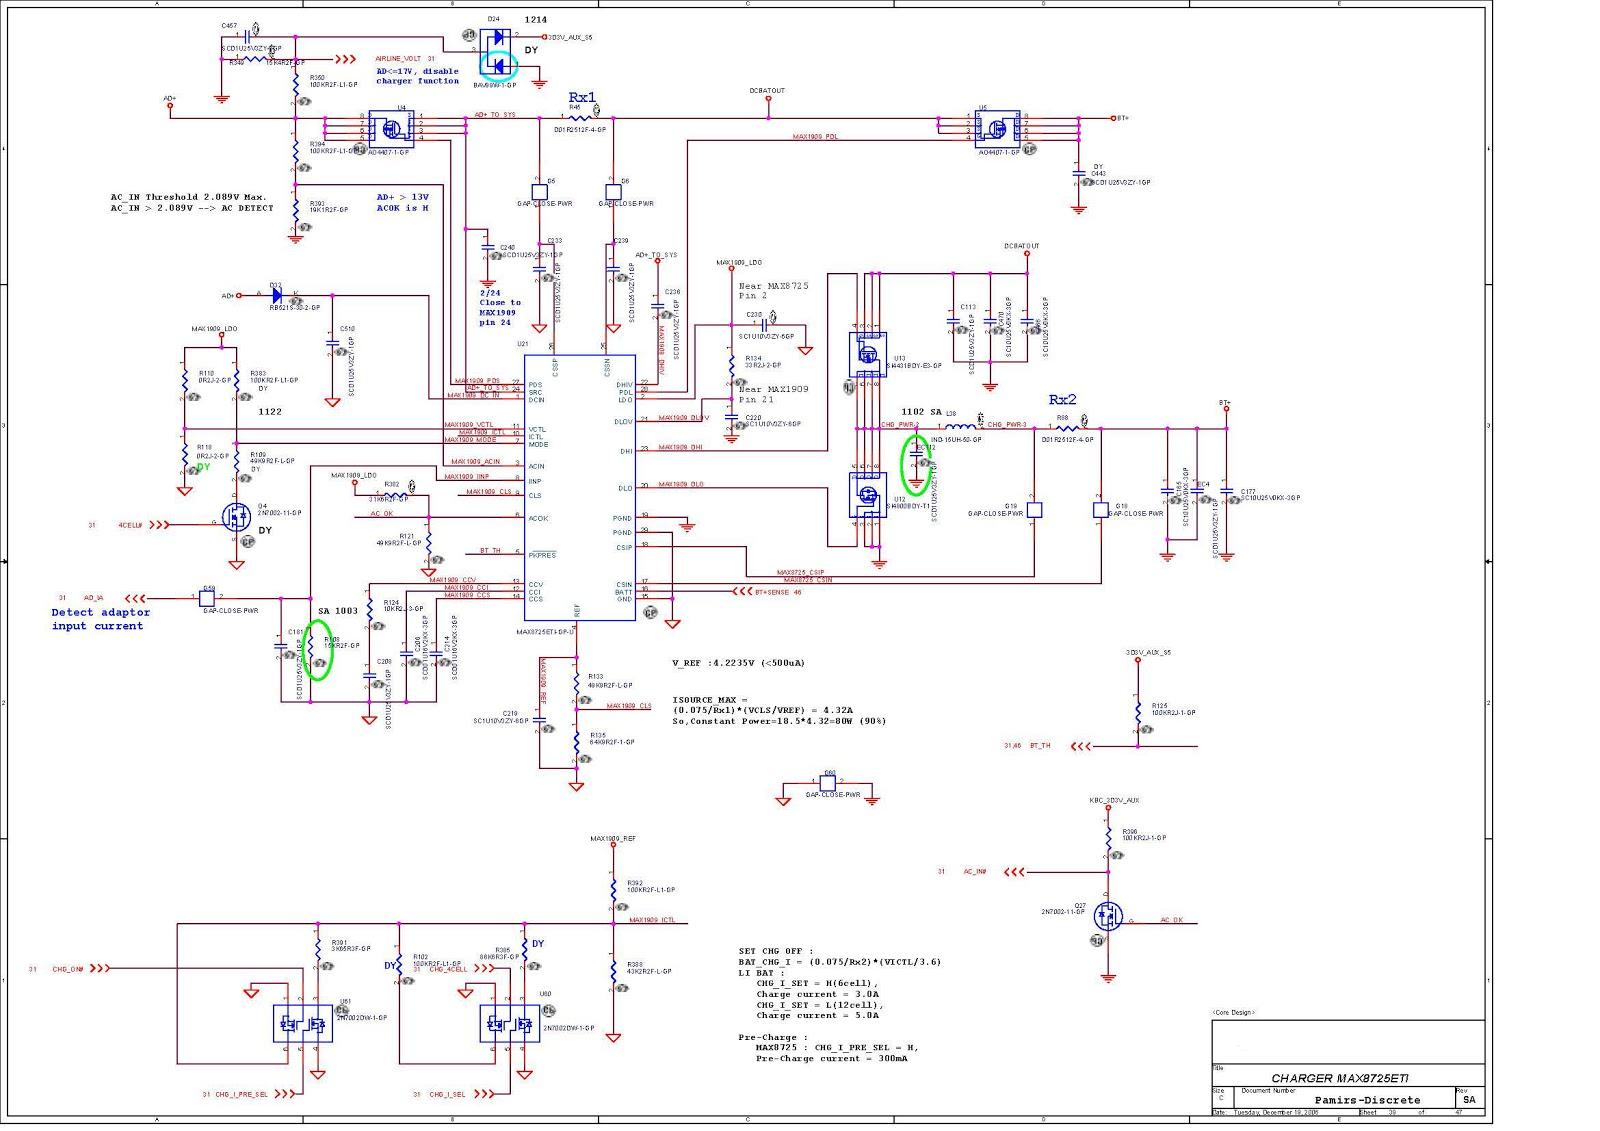 Dell Laptop Power Supply Wiring Diagram Trusted Diagrams Color Battery Circuit Symbols U2022 Desktop Computer